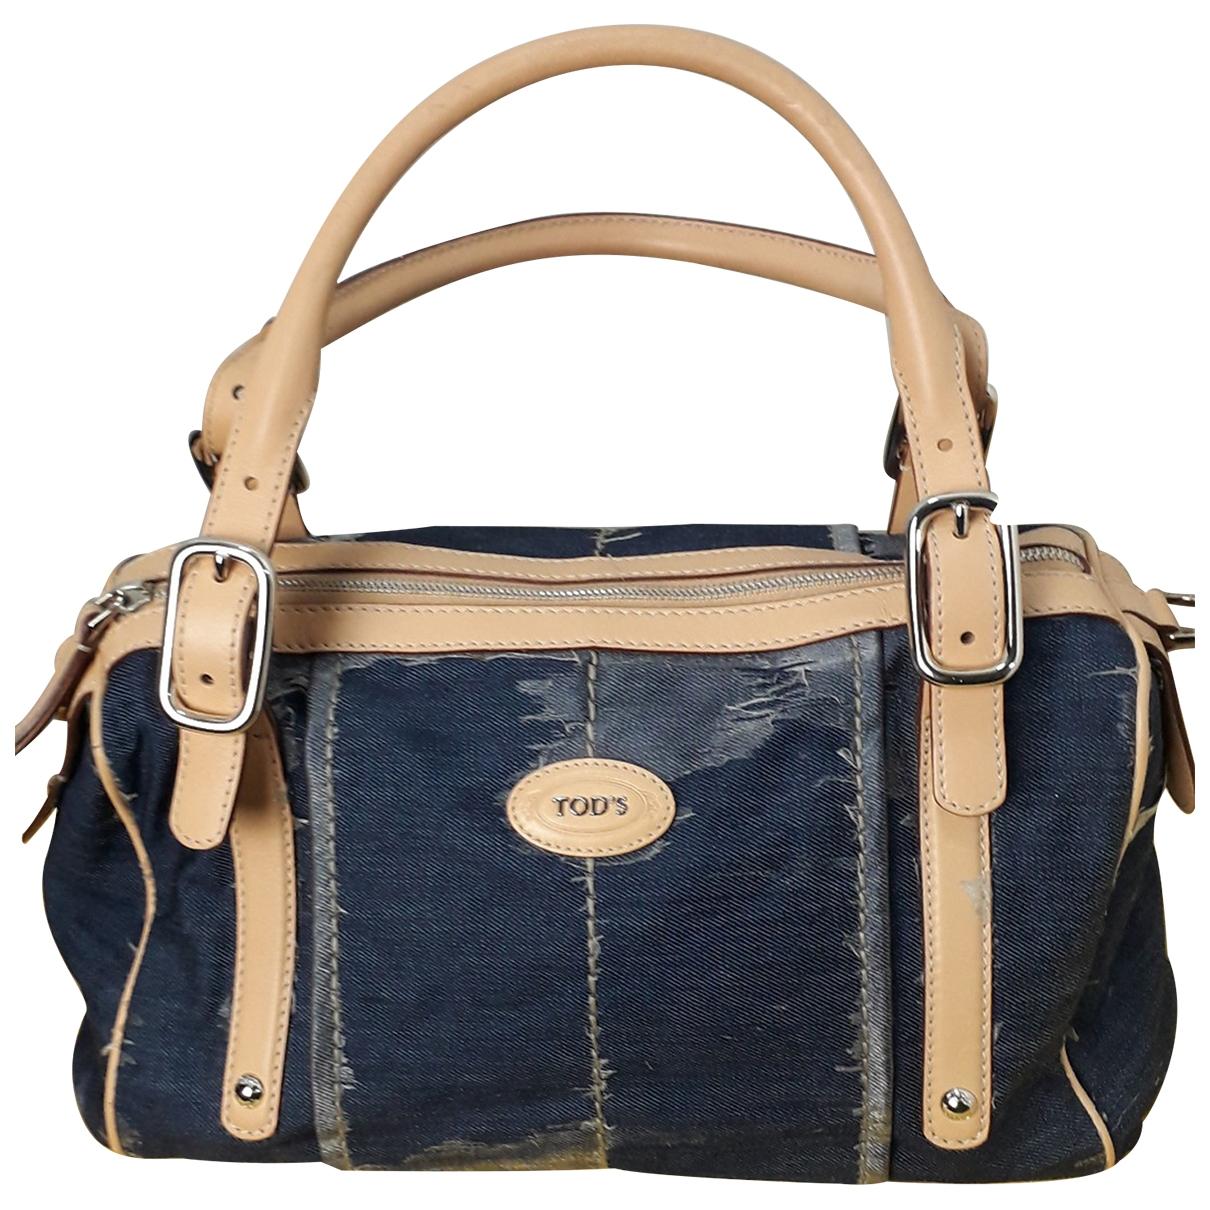 Tods \N Handtasche in  Blau Denim - Jeans